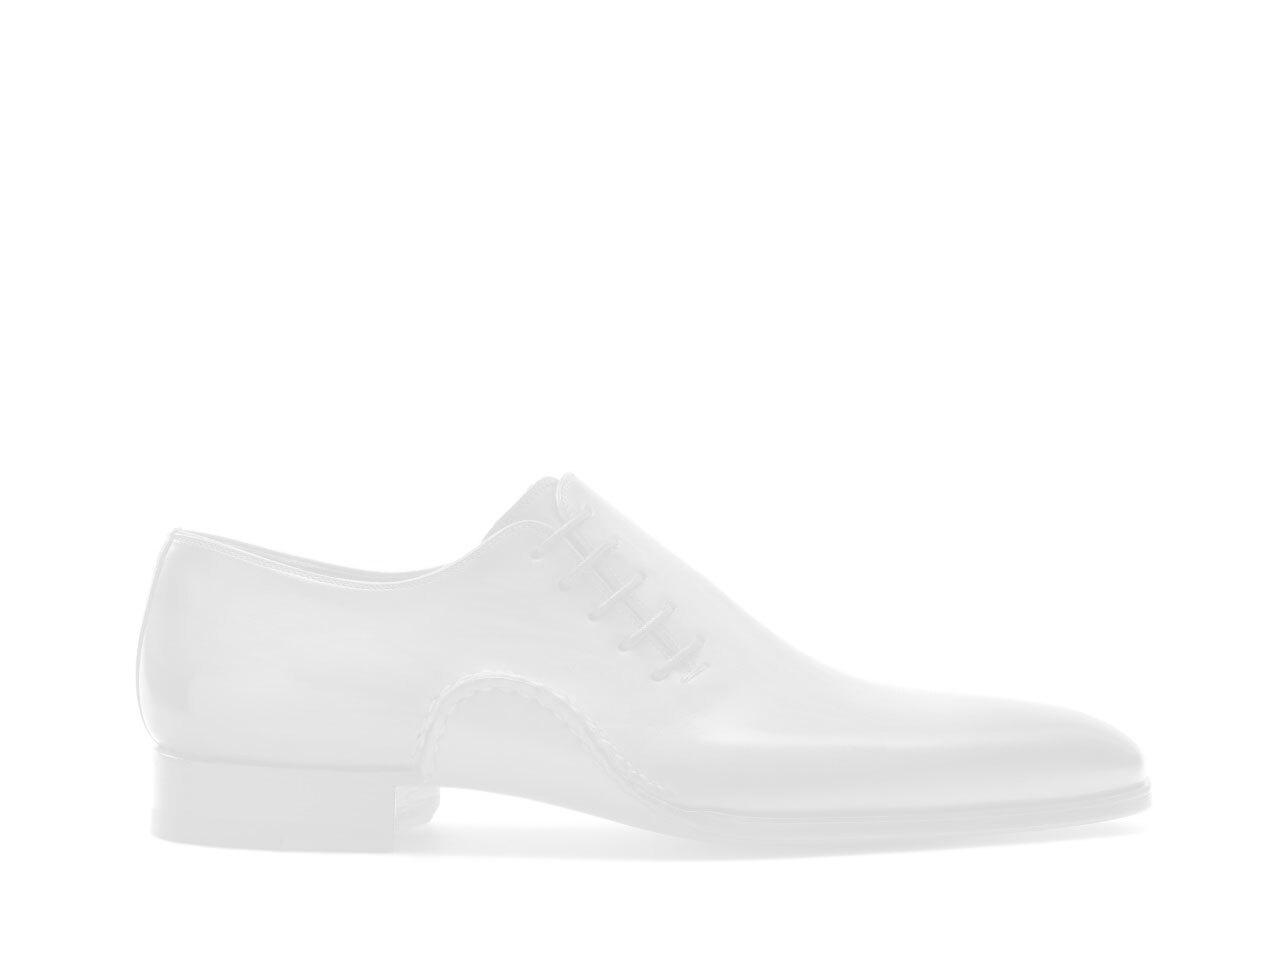 Side view of the Magnanni Derek Royal Men's Double Monk Strap Shoes